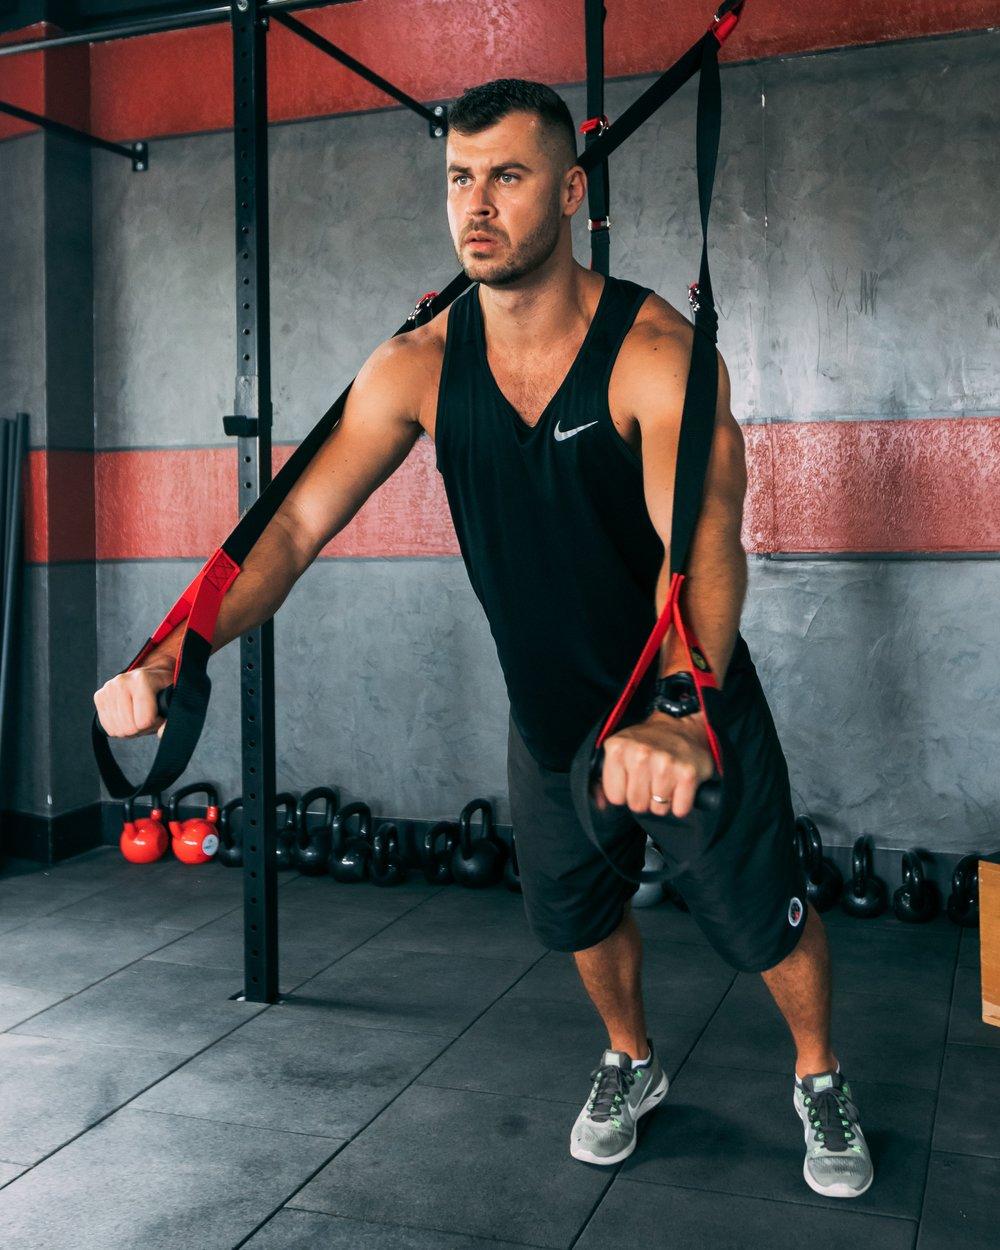 Push Up Variation on a TRX/Suspension Trainer